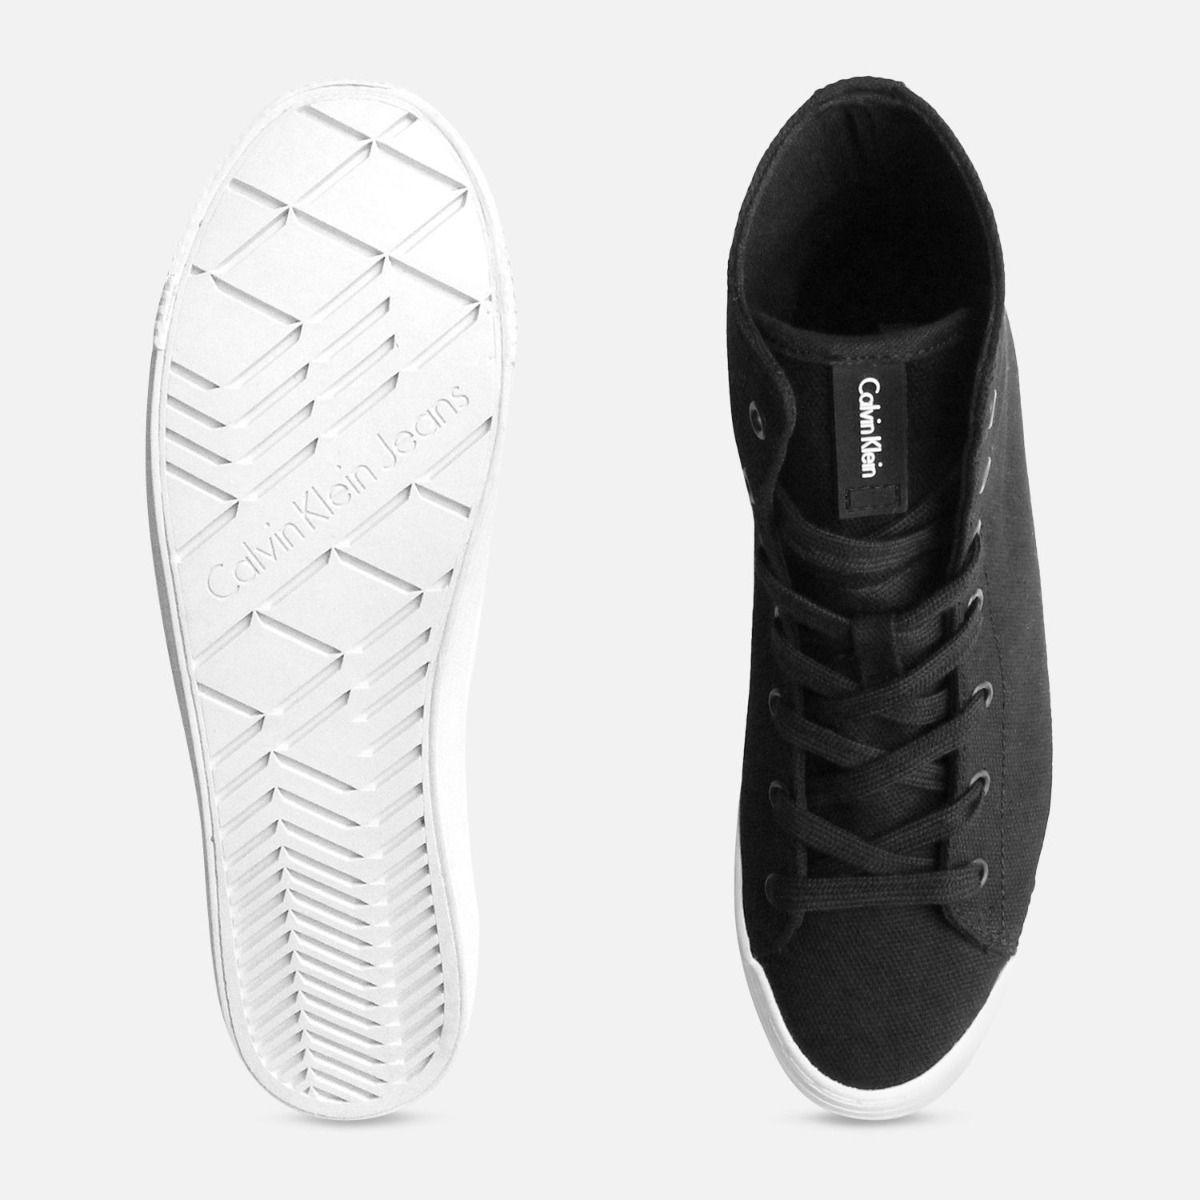 Black Canvas Ritzy Heel Sneakers by Calvin Klein